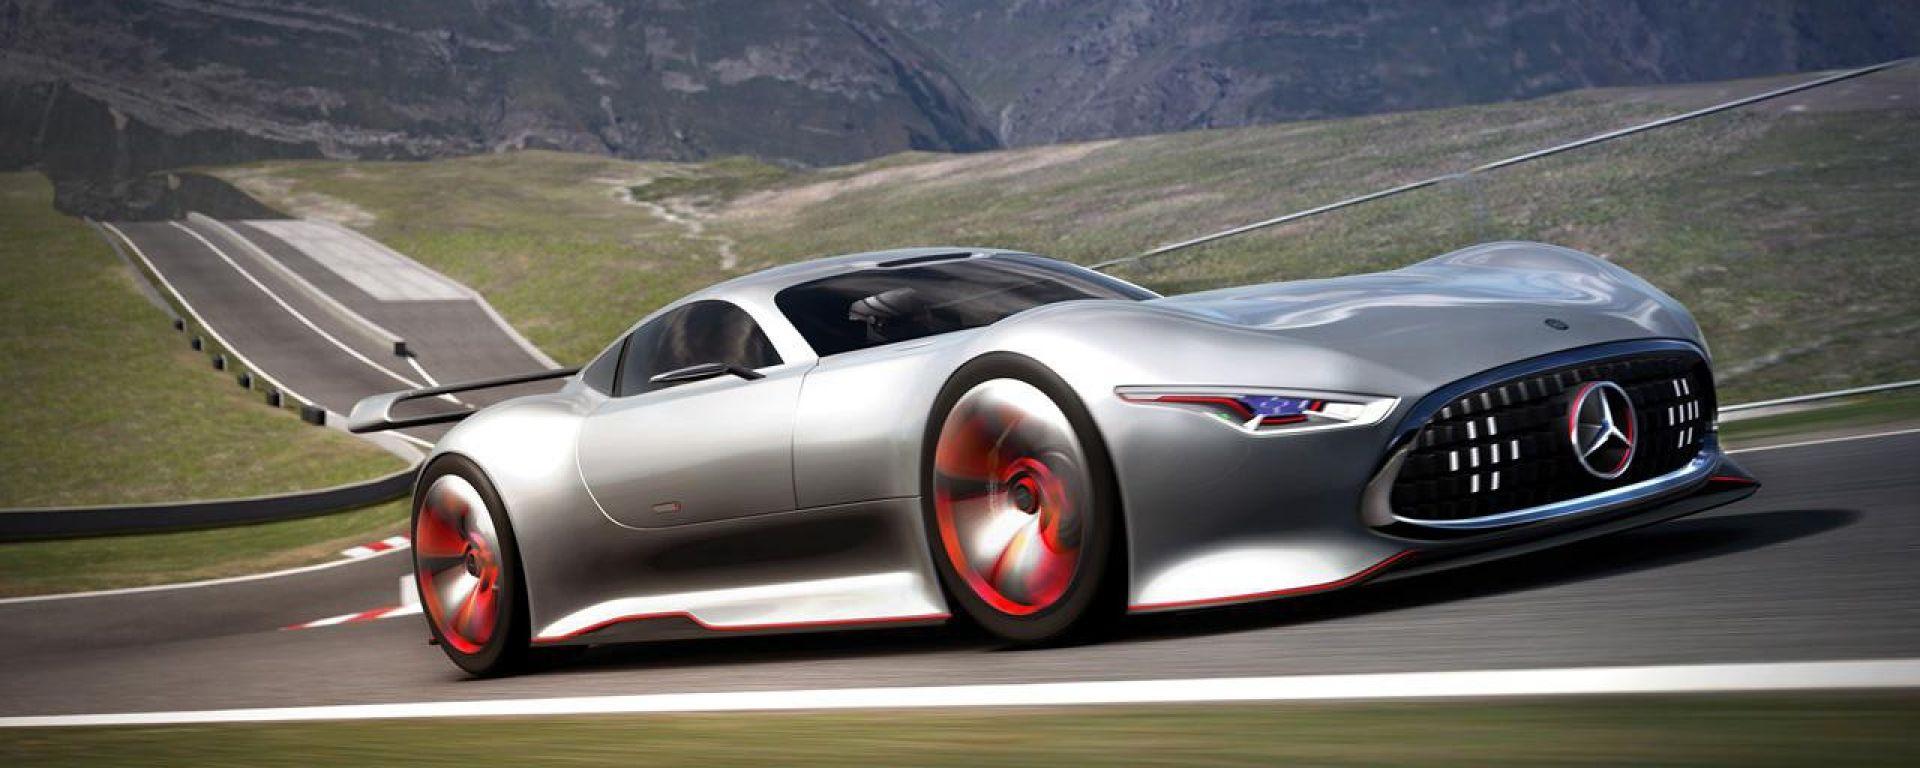 Mercedes AMG Vision Gran Turismo Racing Series